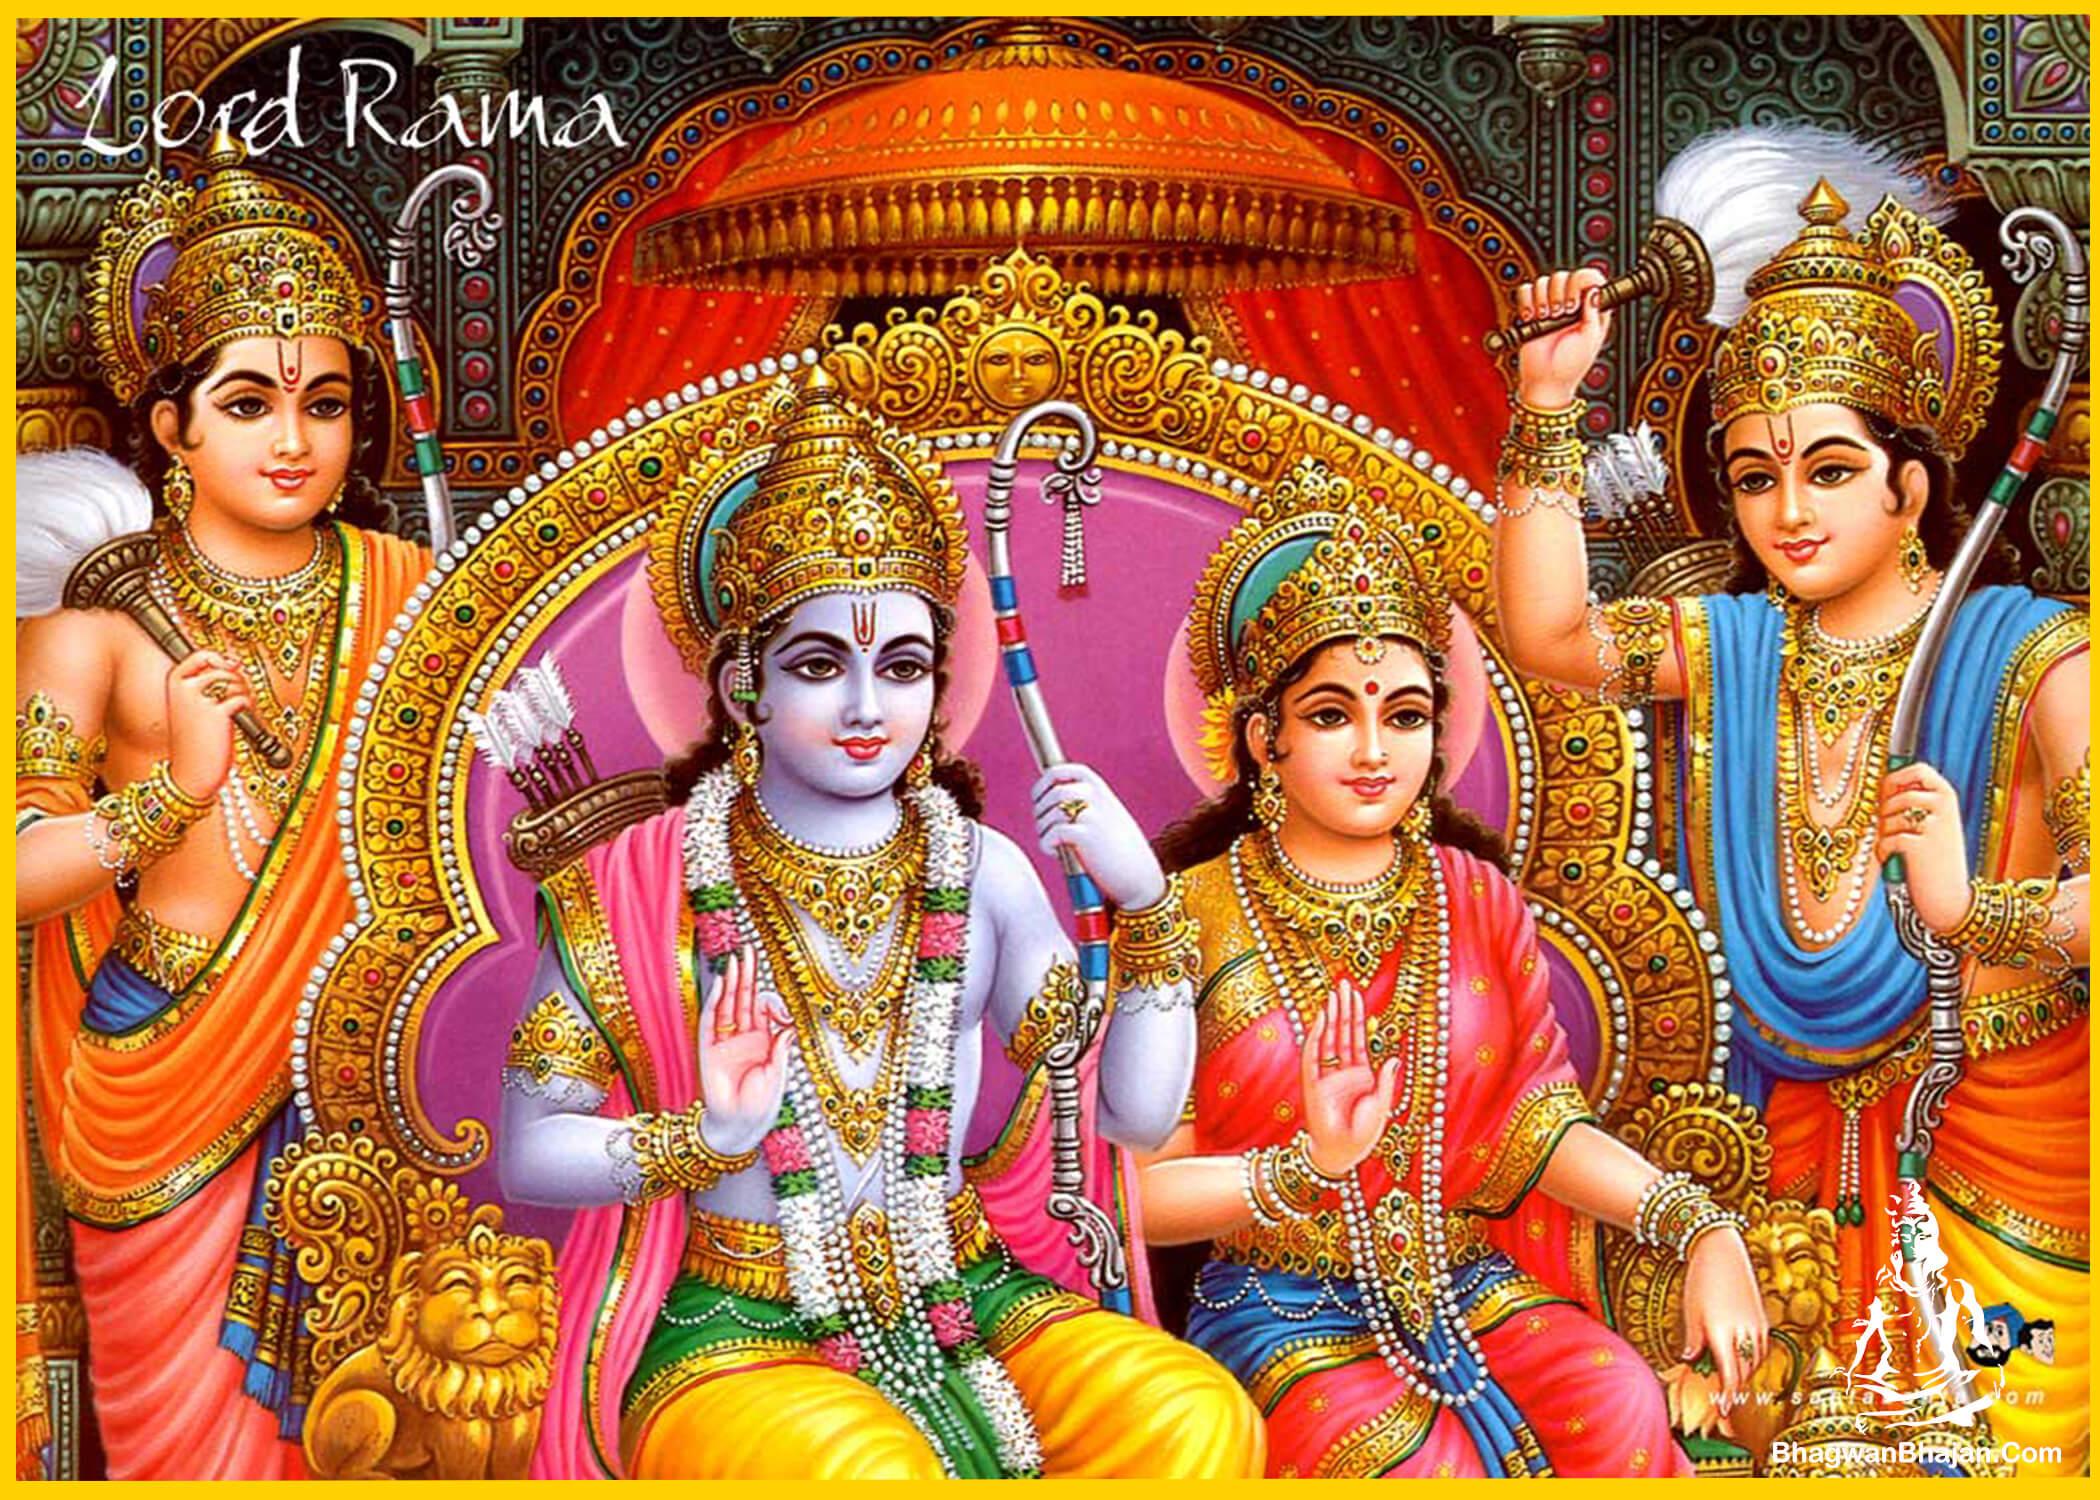 bhagwan ram mata sita ayodhya darbar wallpaper